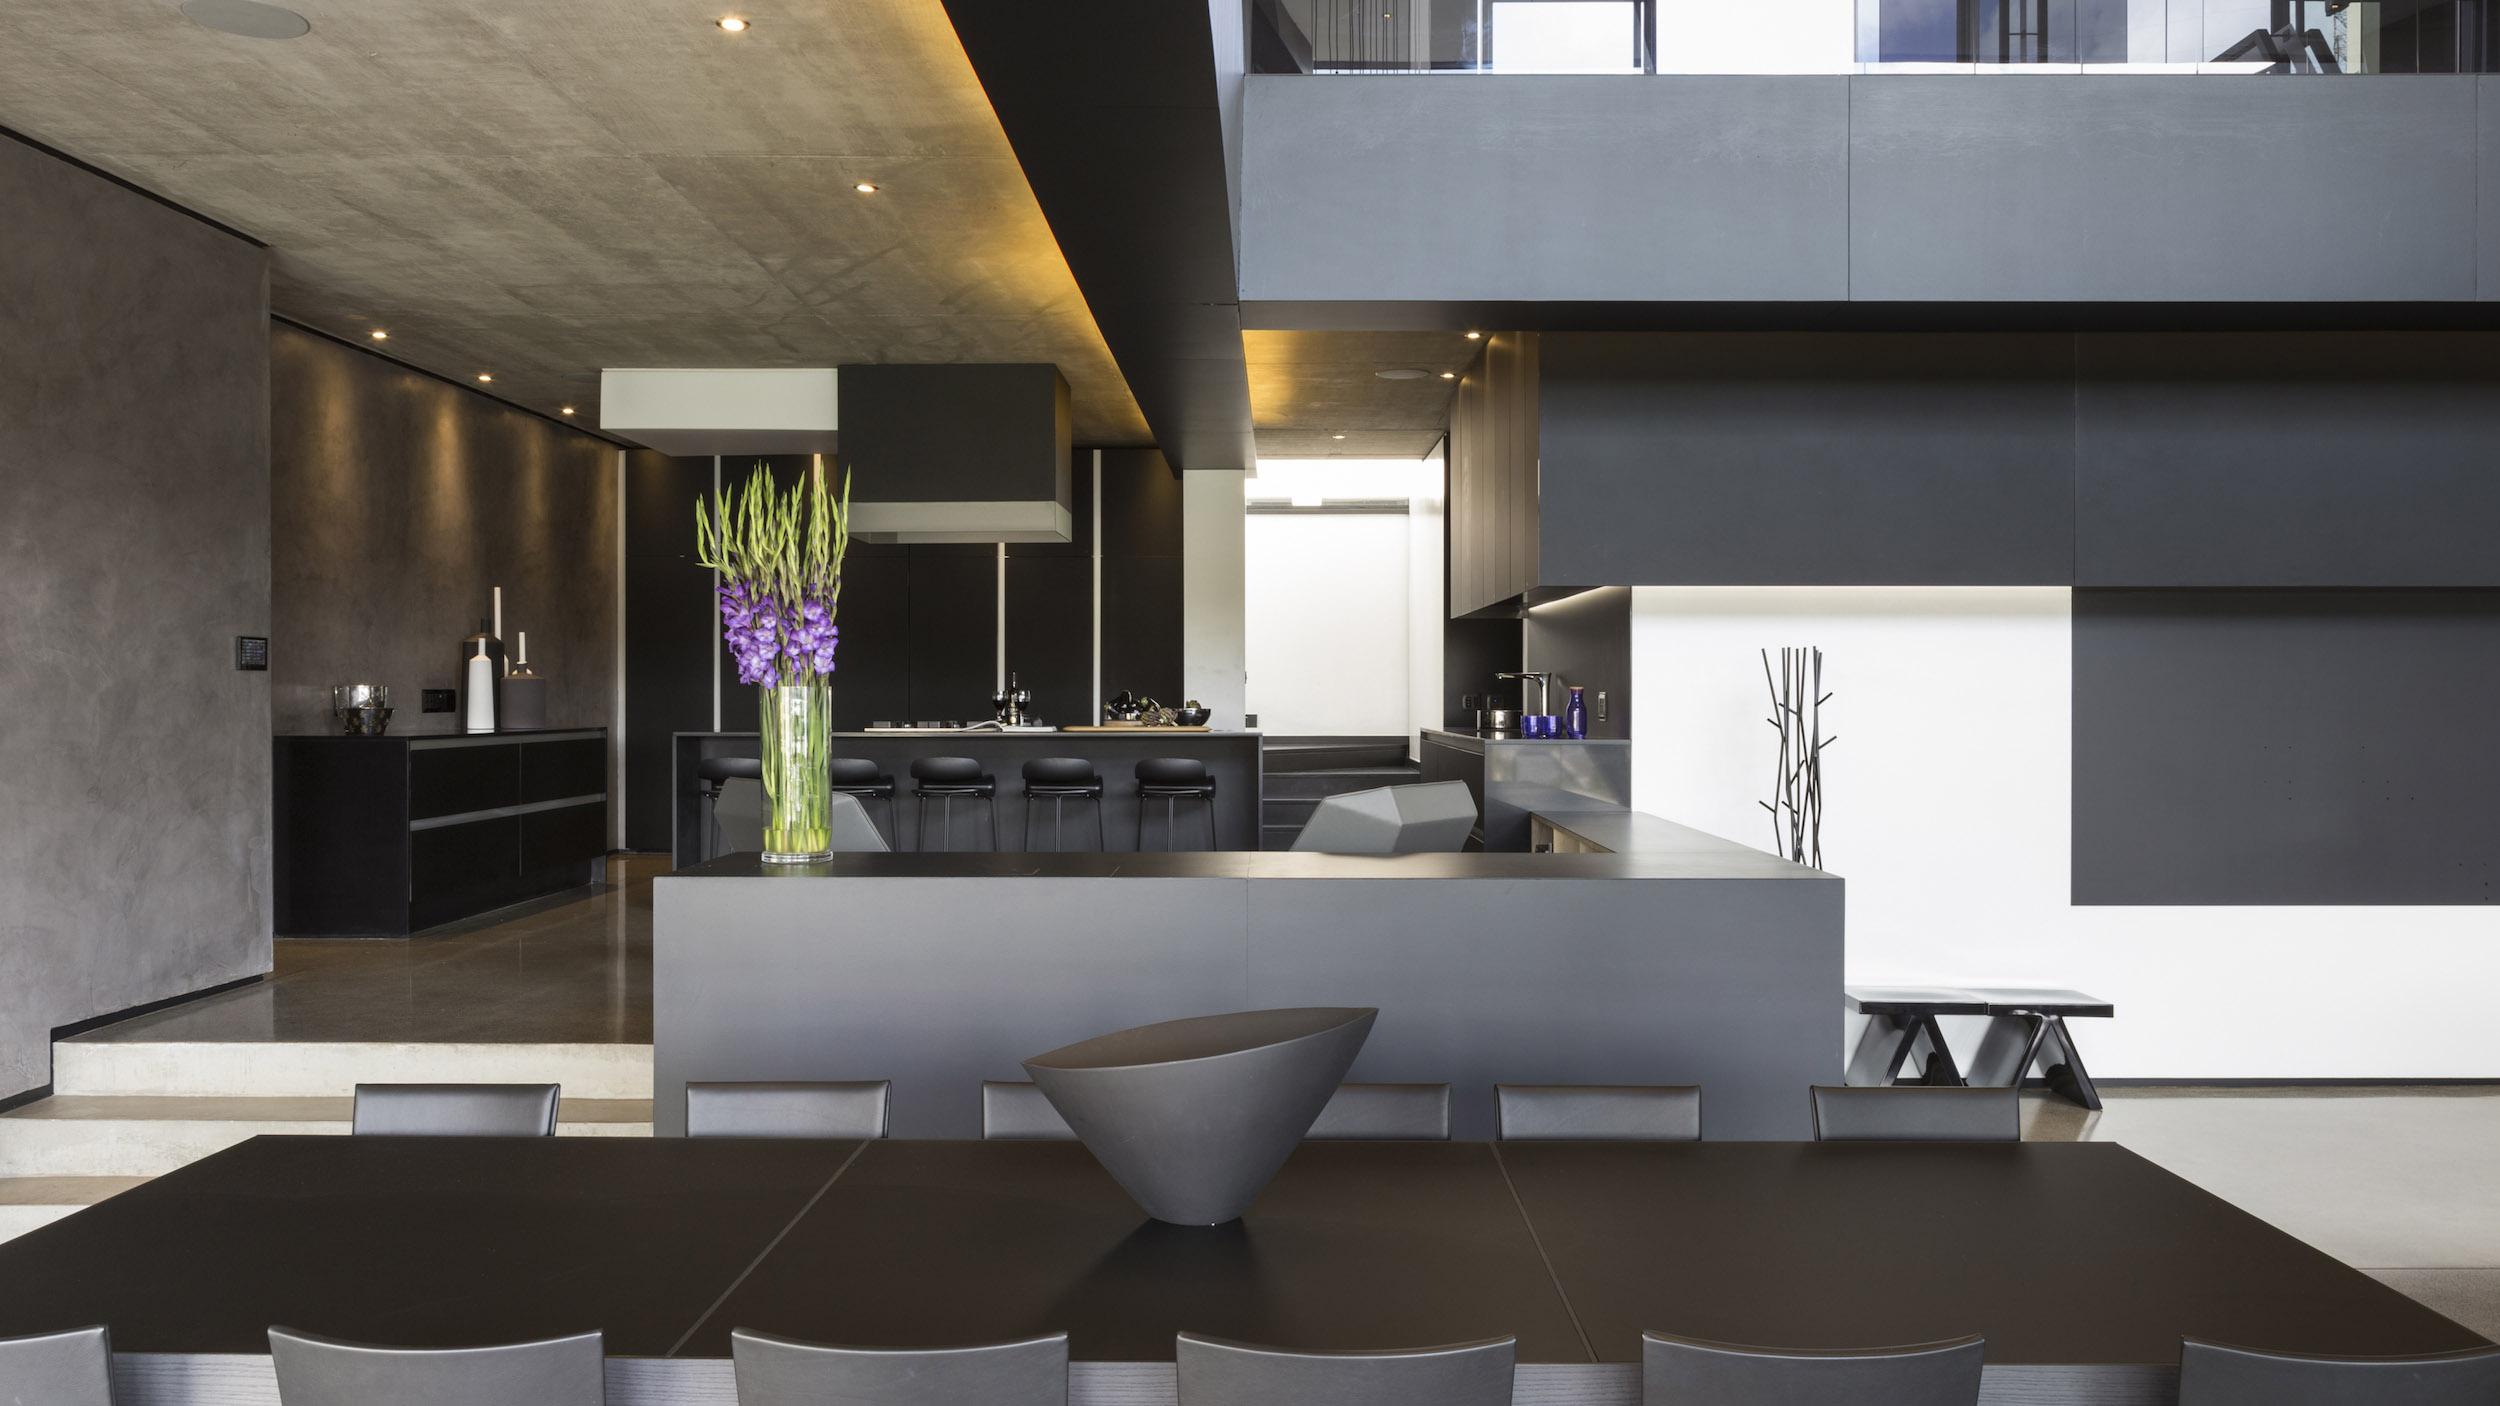 Kloof Road Masterpiece House in Johannesburg by Nico van der Meulen Architects-27